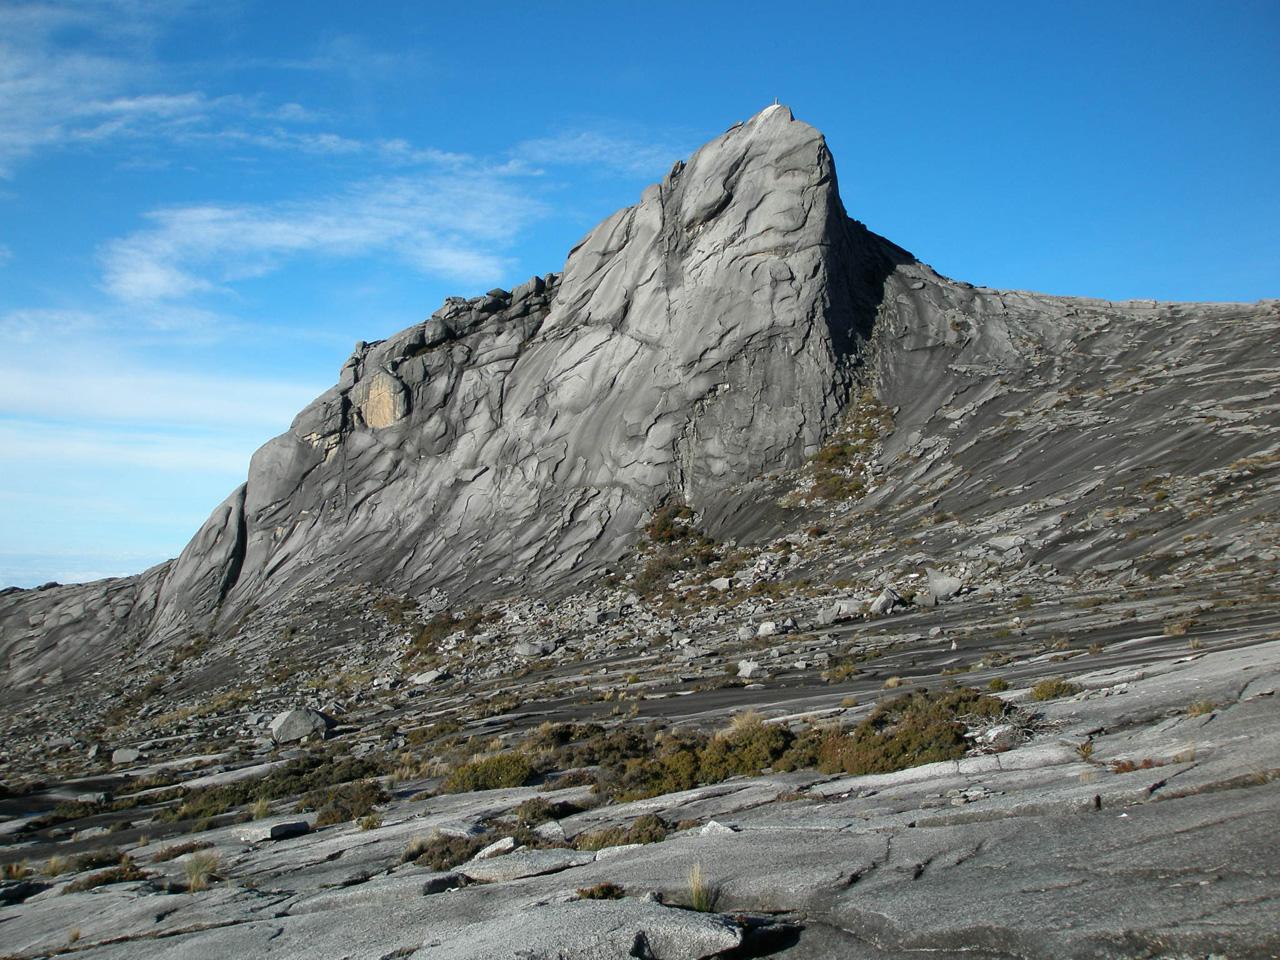 South Peak on Mount Kinabalu, tallest mountain in South